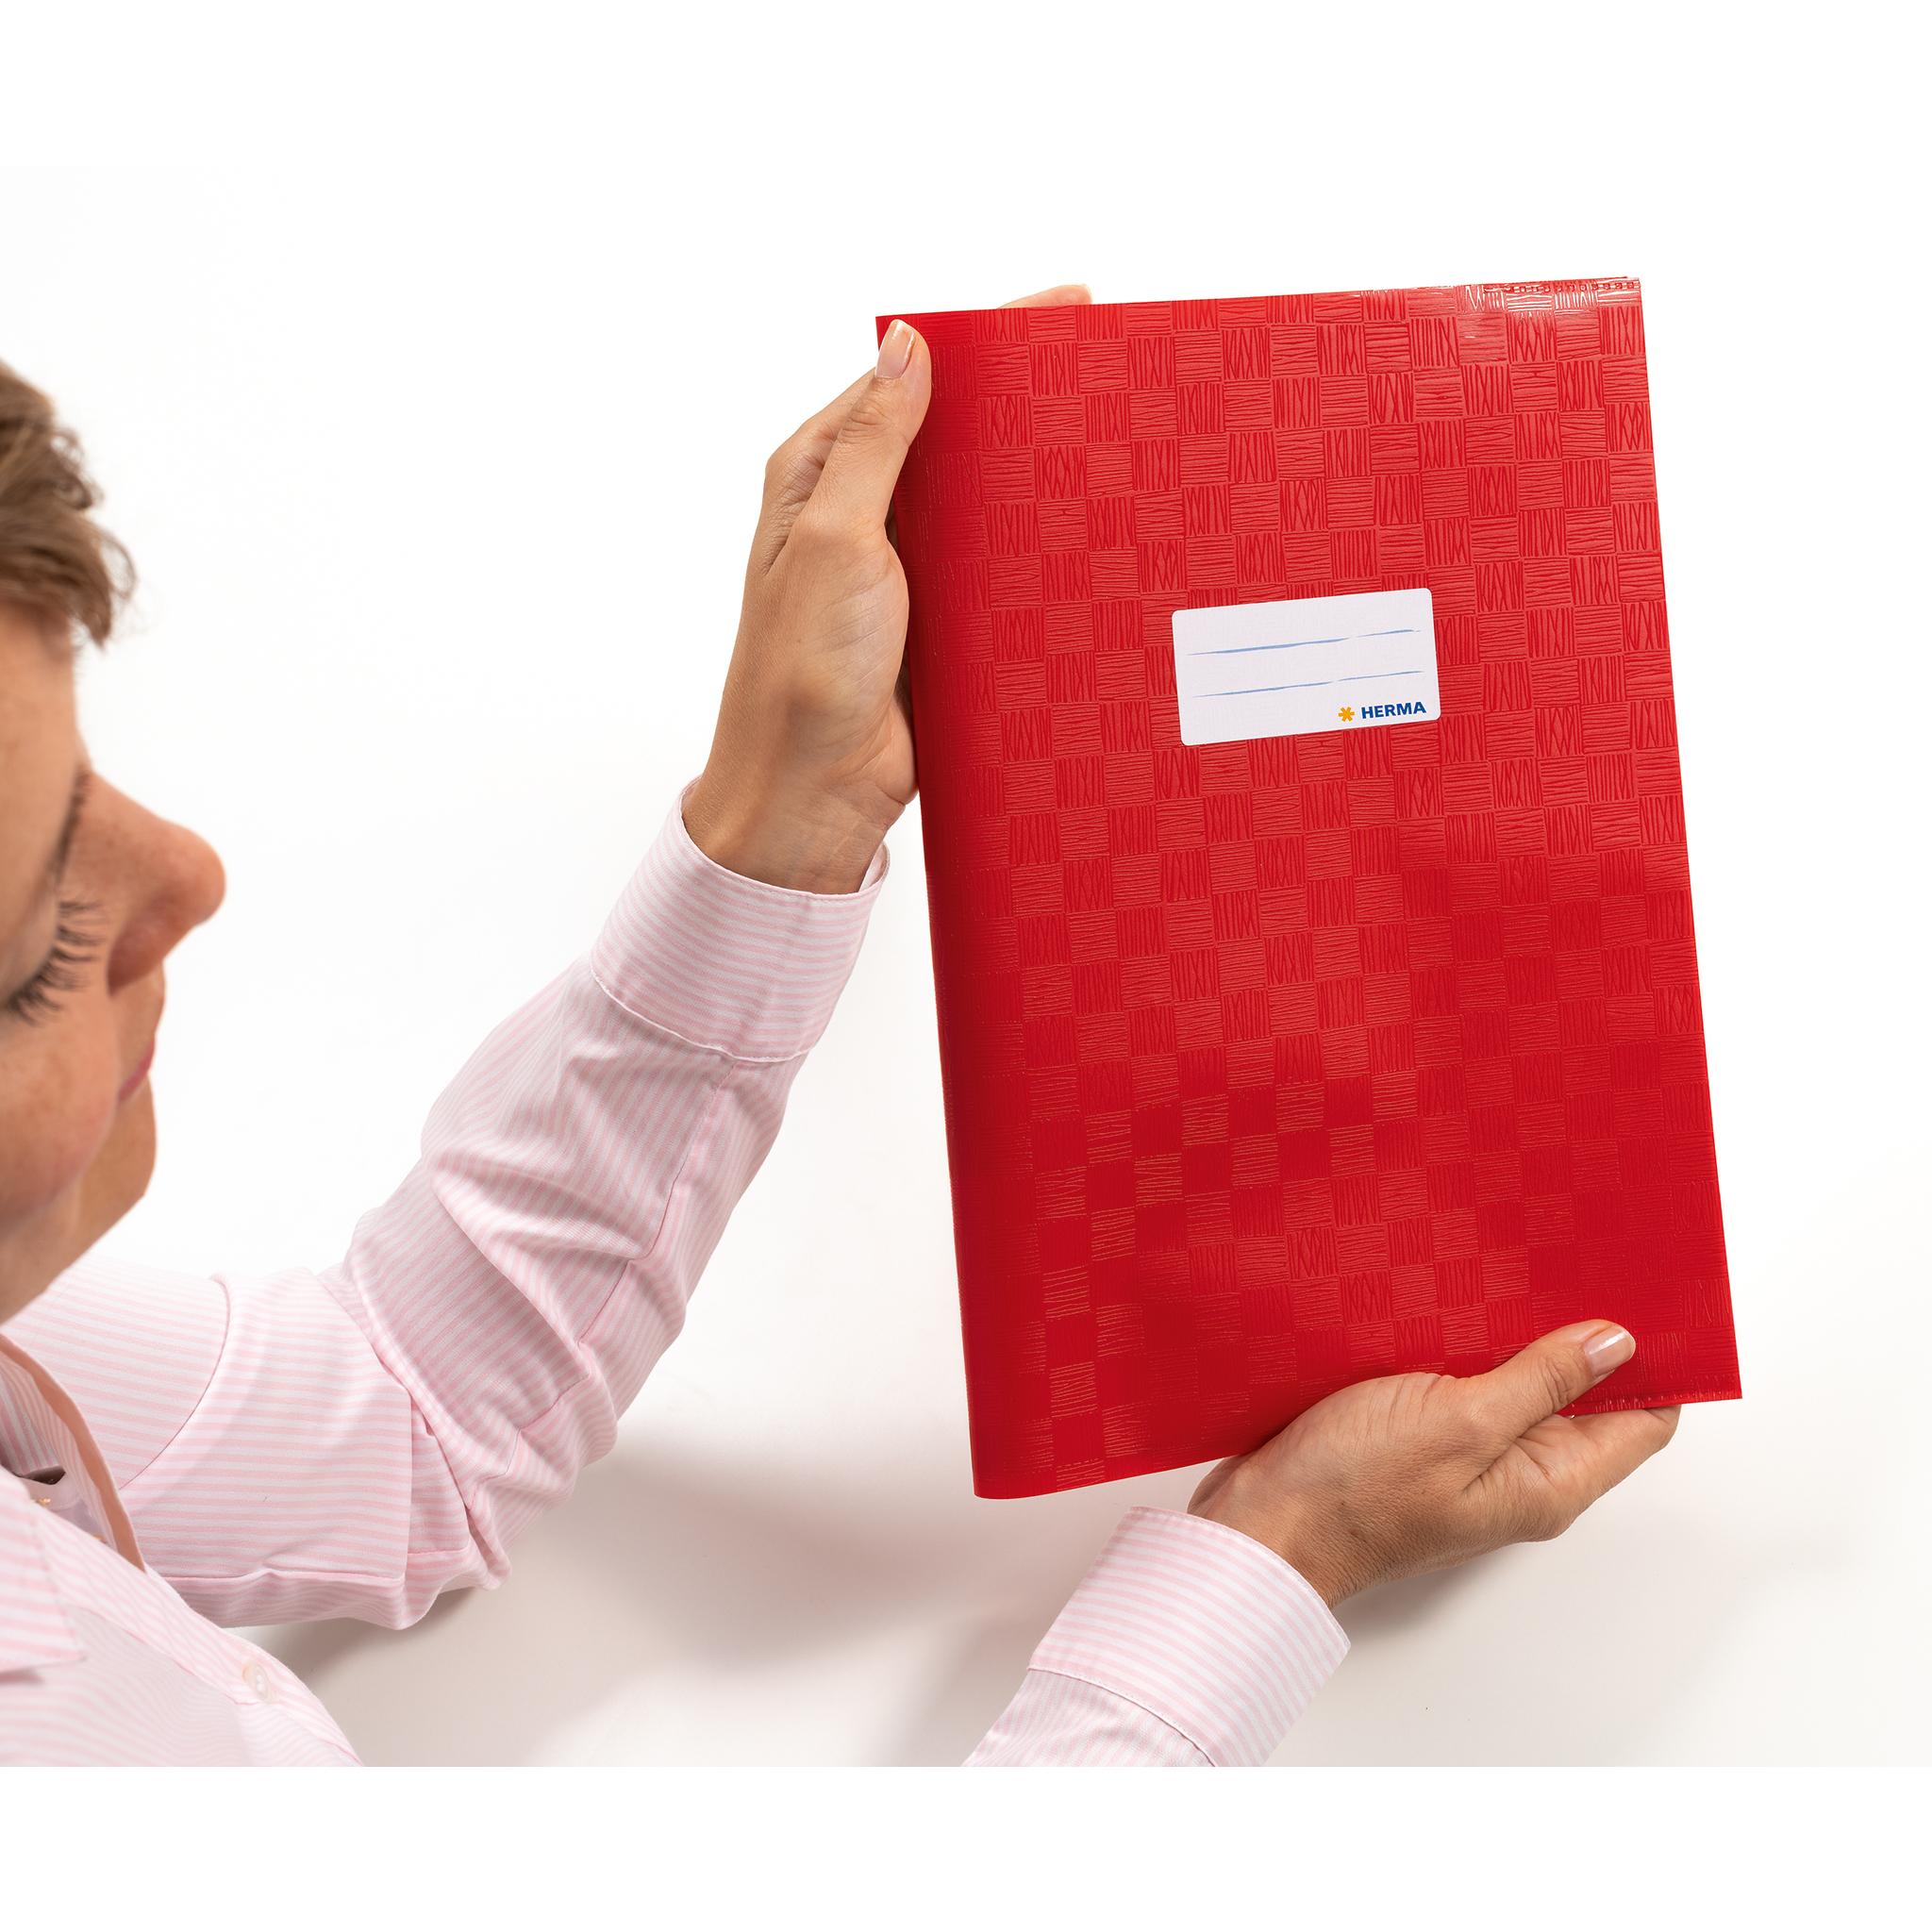 HERMA Heftschoner A4 PP rosa gedeckt